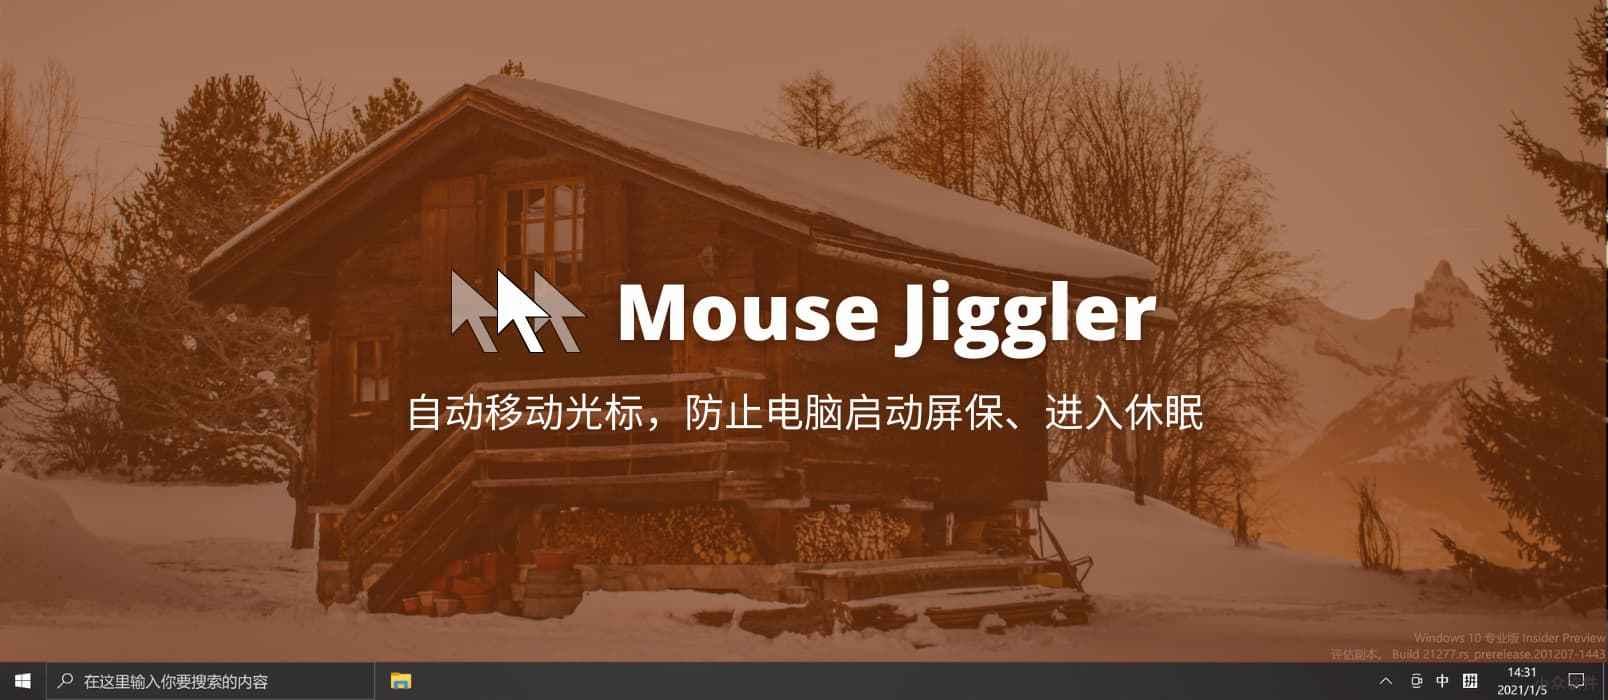 Mouse Jiggler:自动移动光标,防止电脑启动屏保、进入休眠